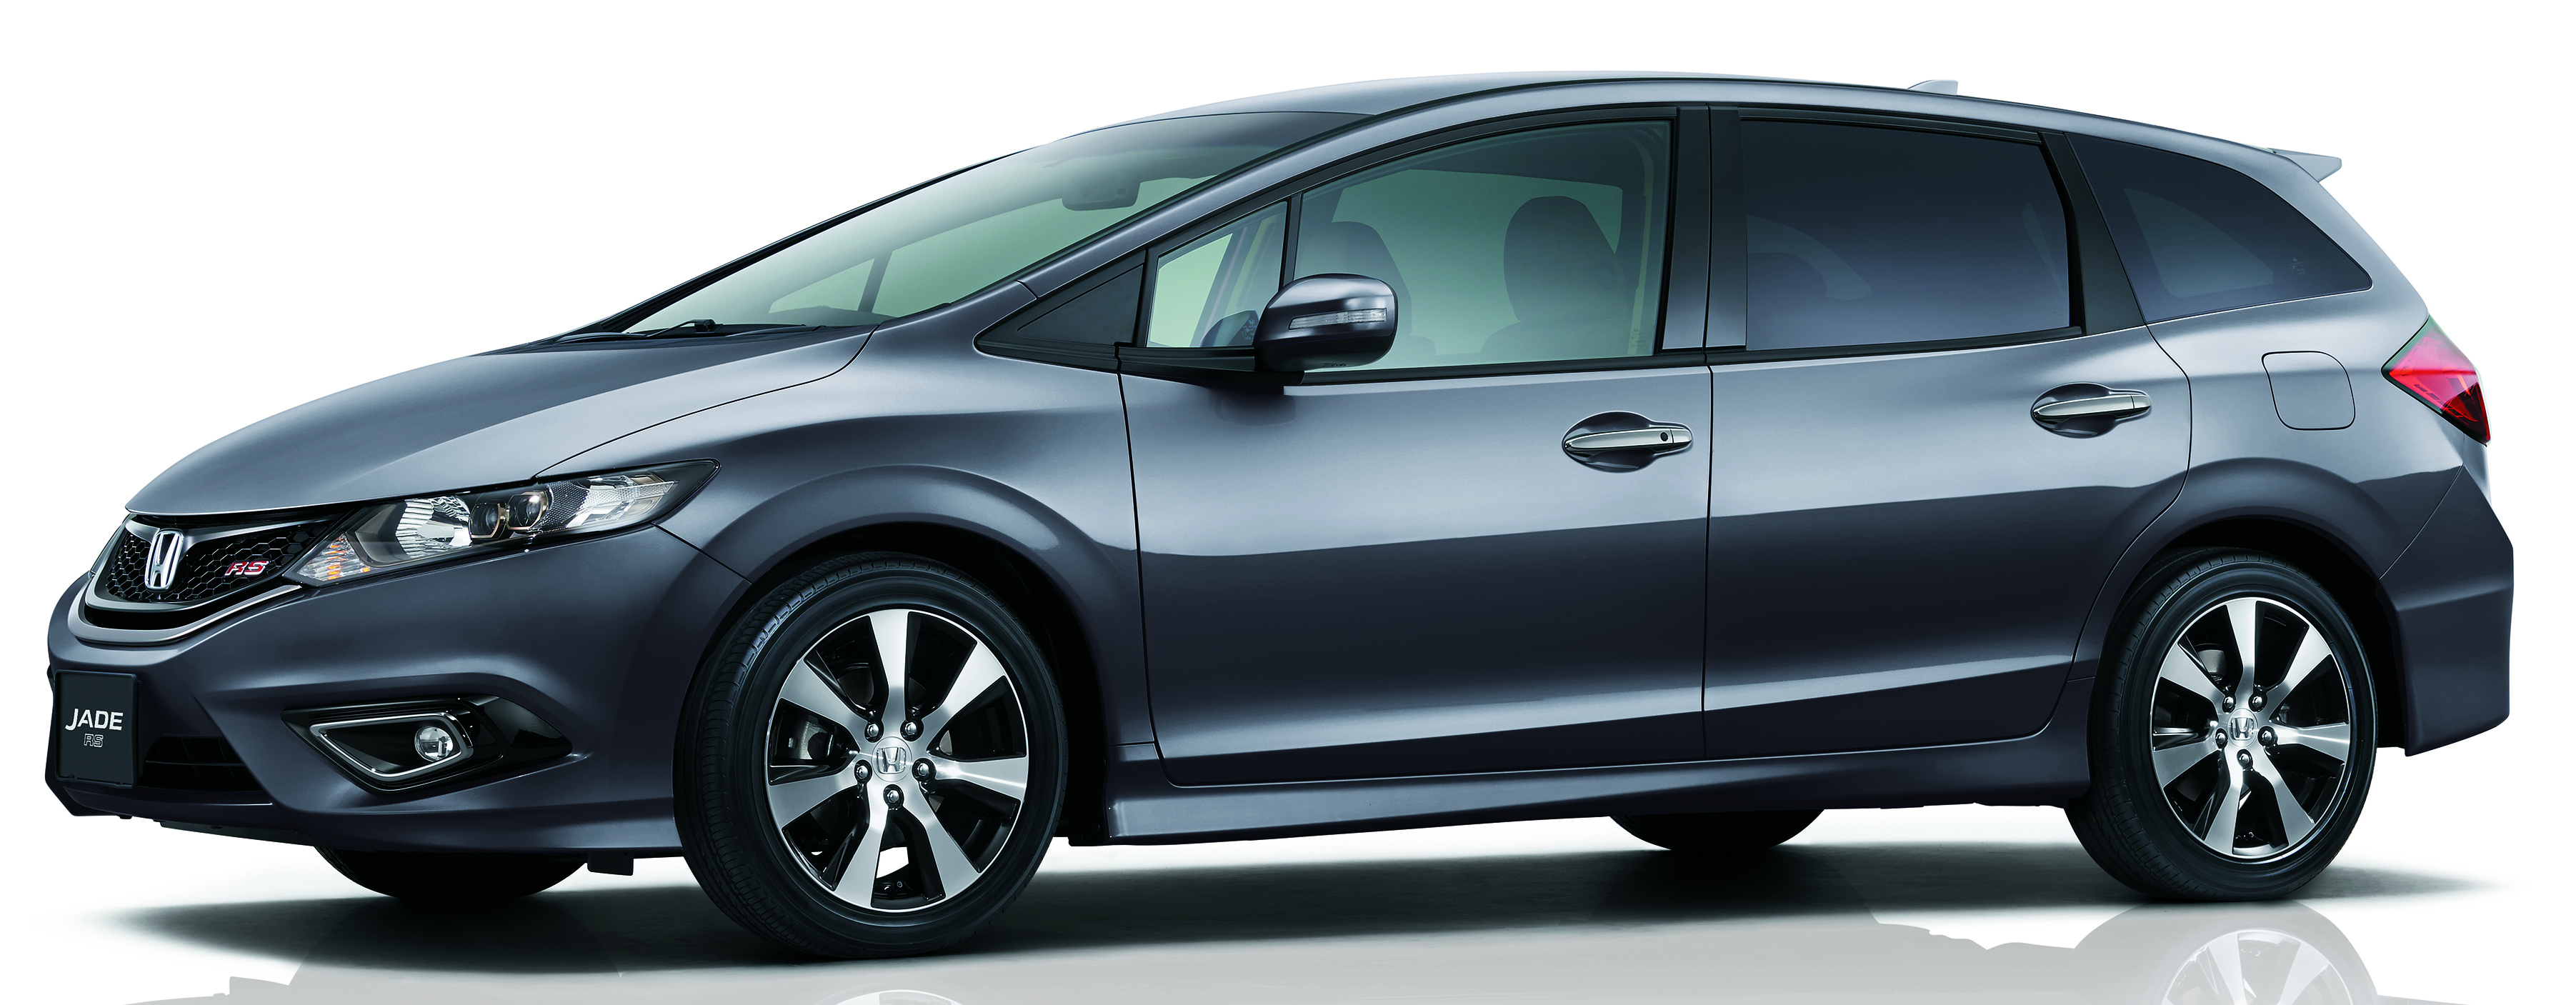 Honda Jade Rs Debuts With New Vtec Turbo Engine Image 341568